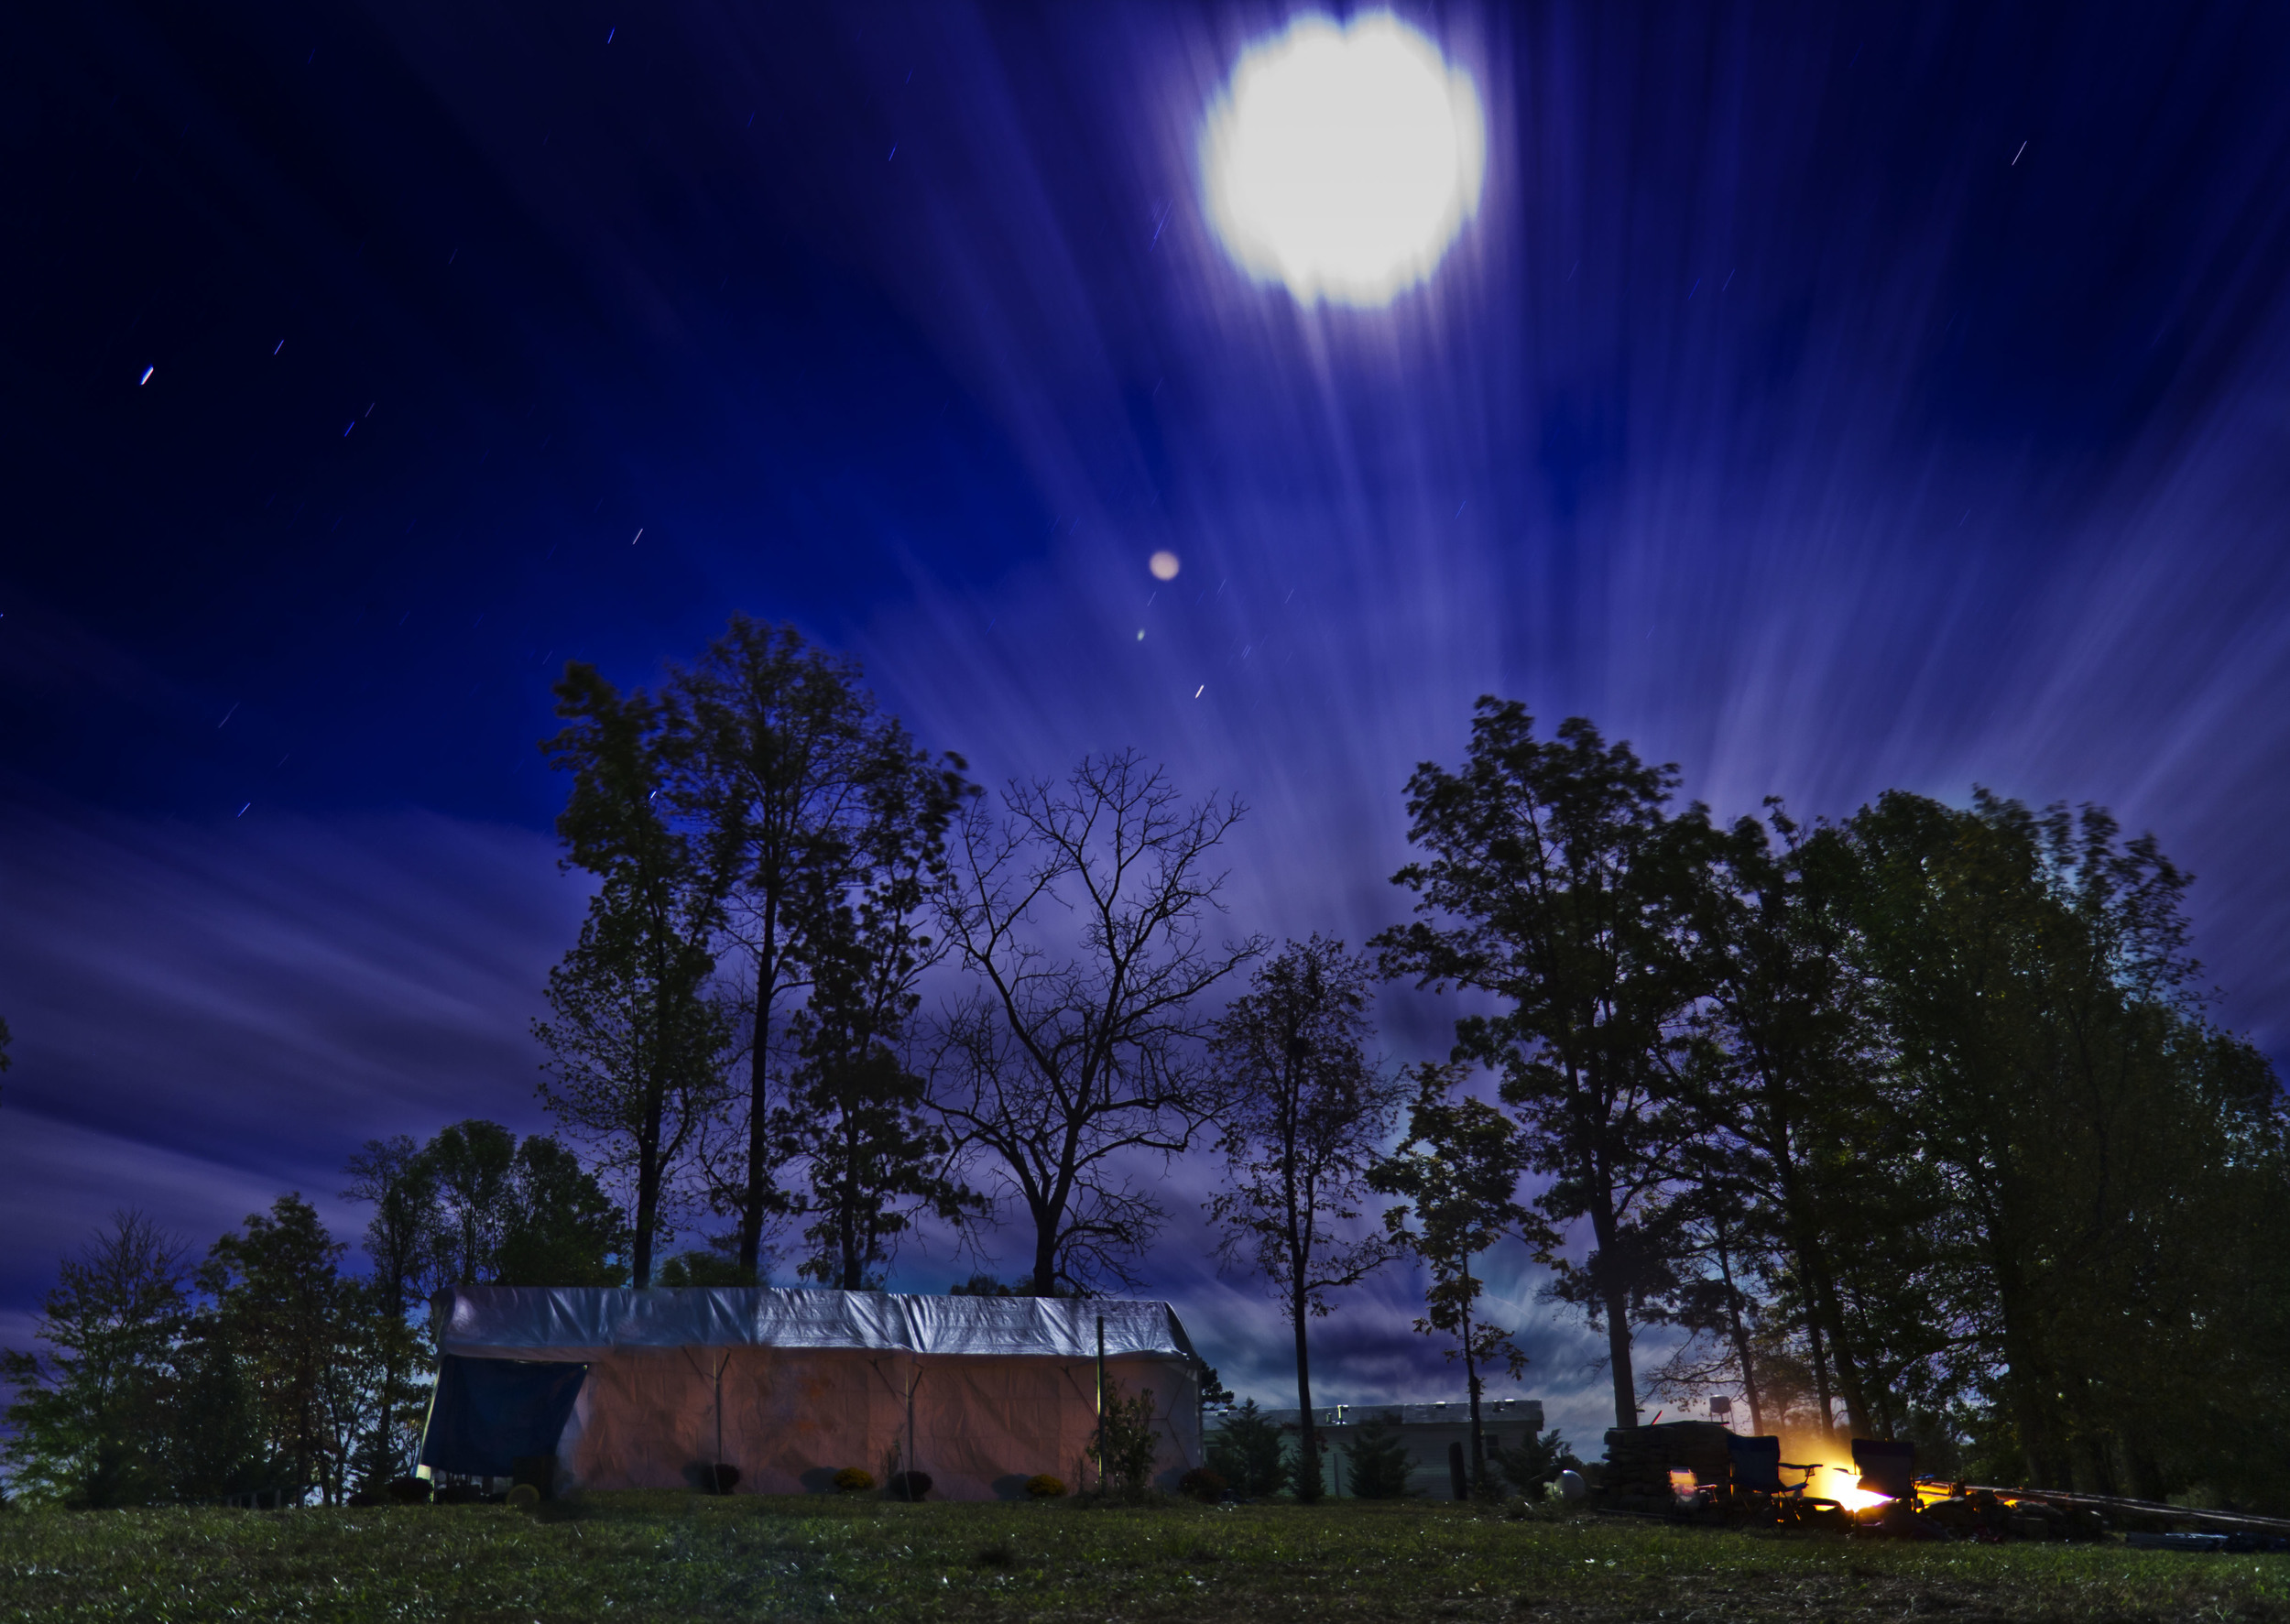 Theme: Random <br>Title: Night Sky